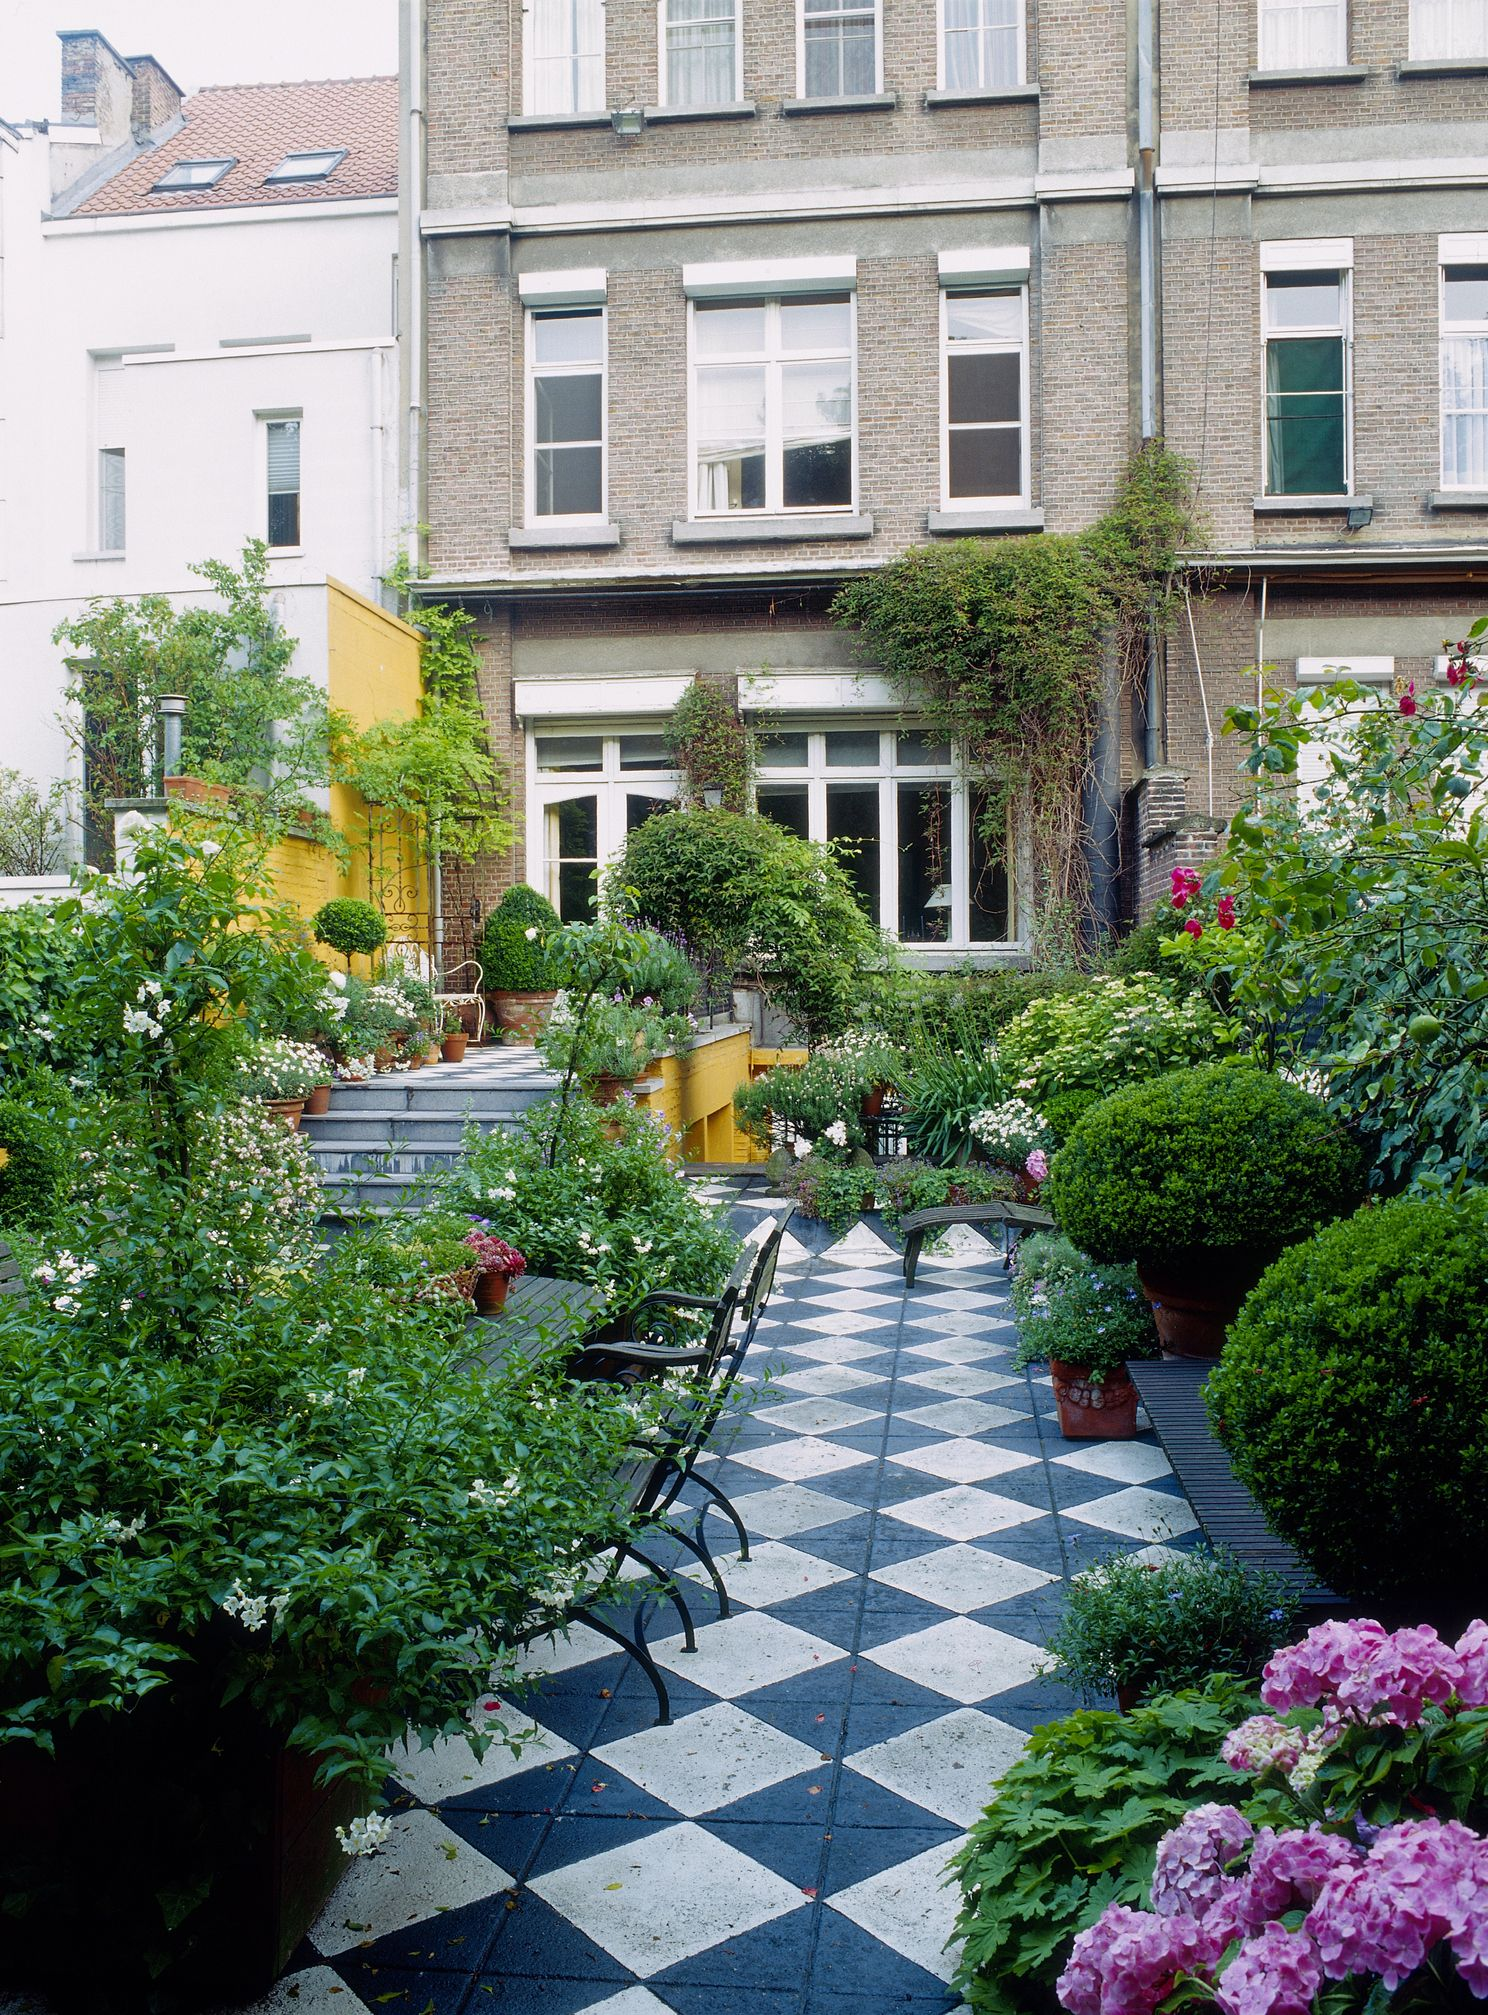 Long Narrow Garden Design Ideas - Garden Shape Ideas on Patio Shape Designs id=71732